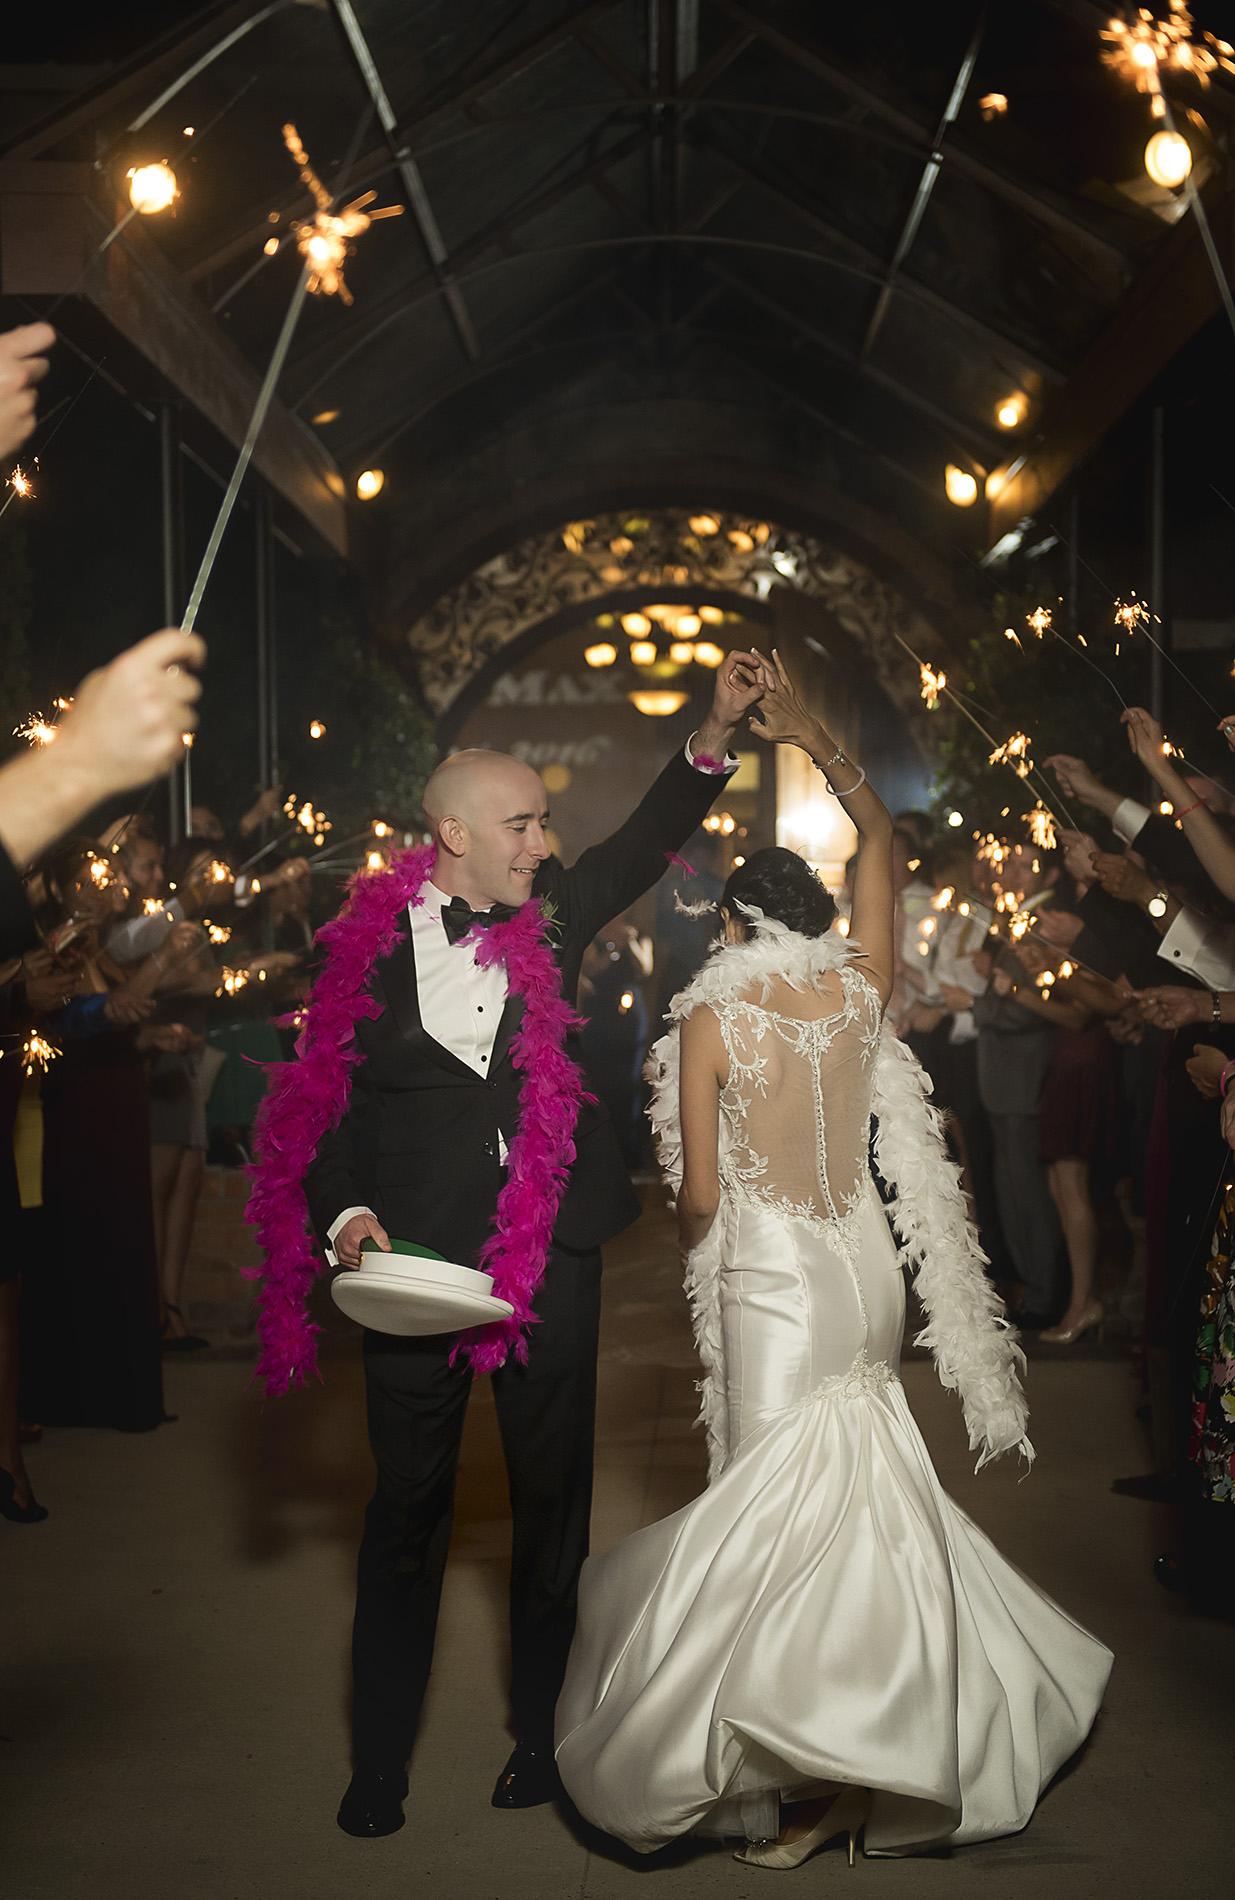 Houston-venue-Olde-Dobbin-Station-Romantic-Classic-Wedding-Photographer-123.jpg